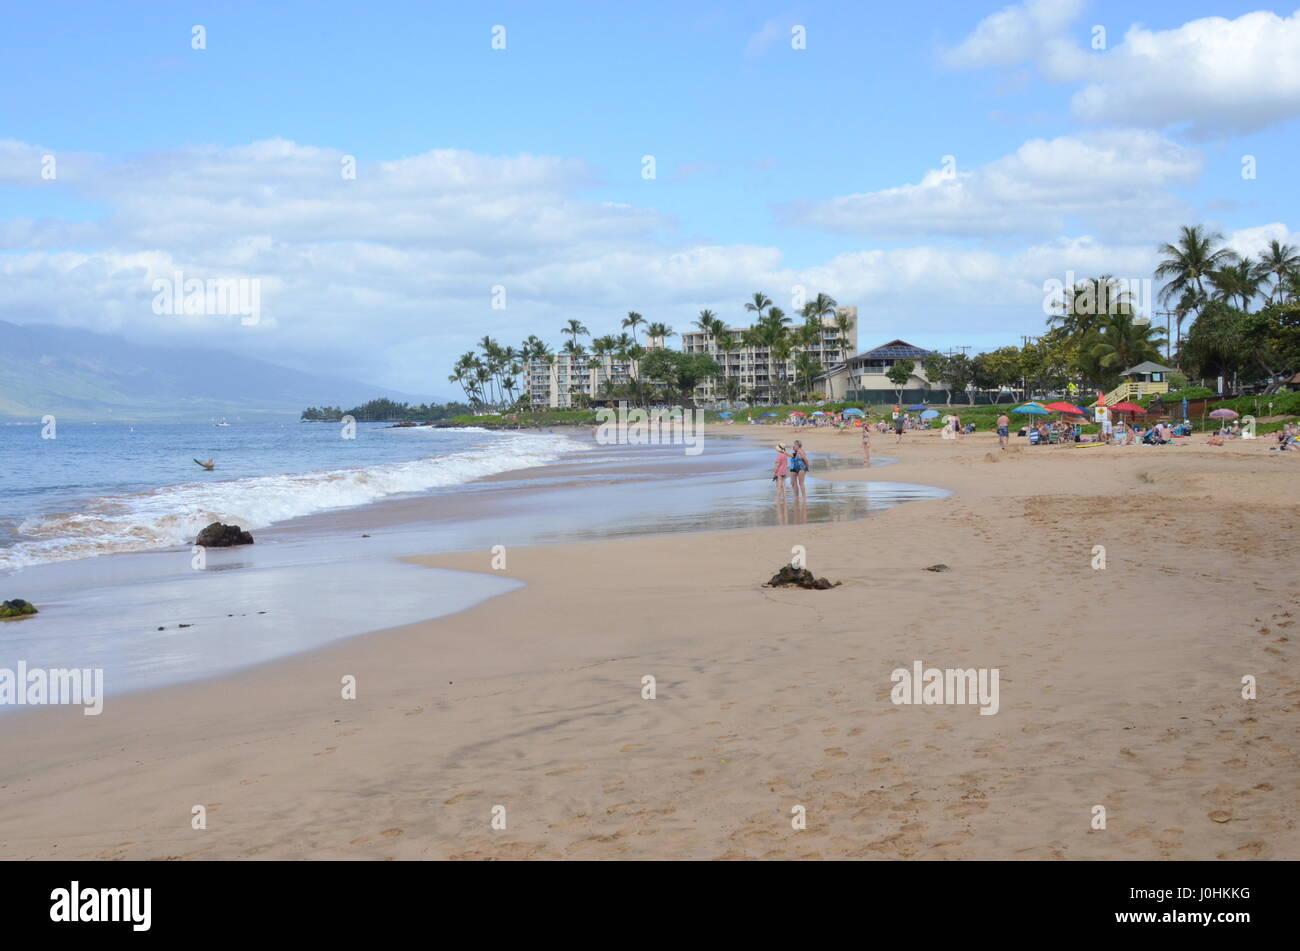 Beach in Maui, Hawaii, USA - Stock Image